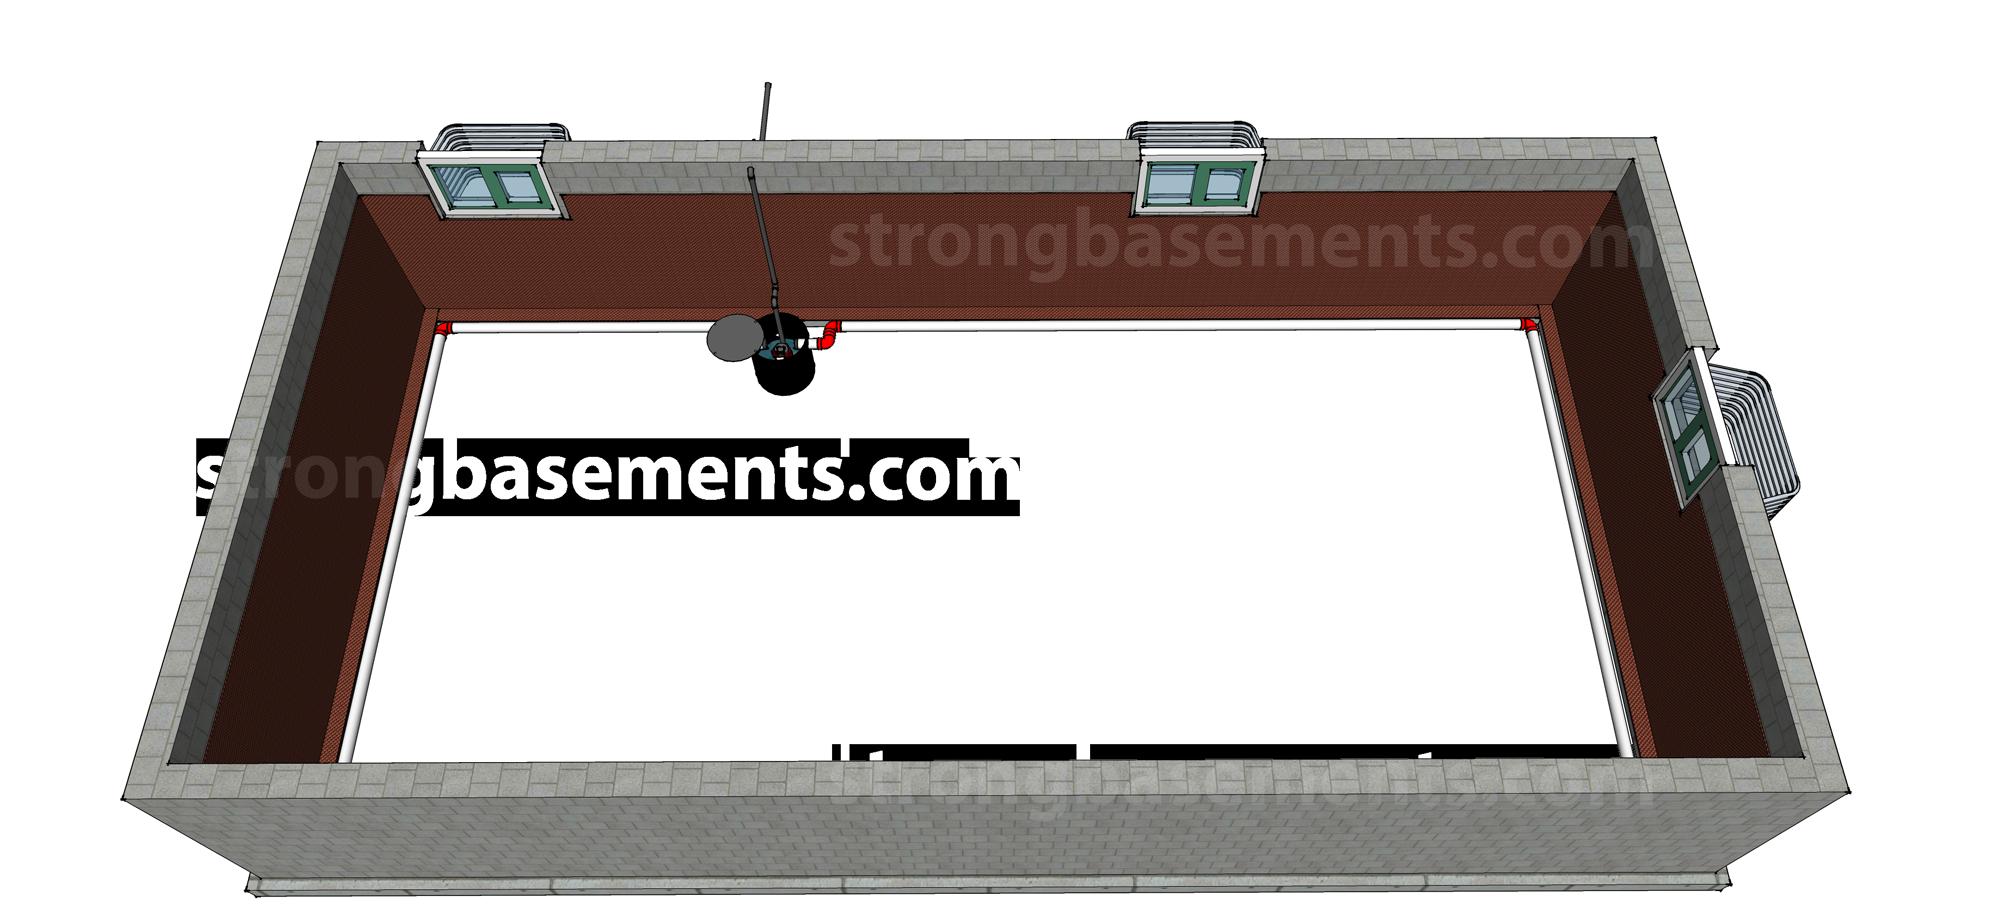 Interior-Basement-Waterproofing-Step-4